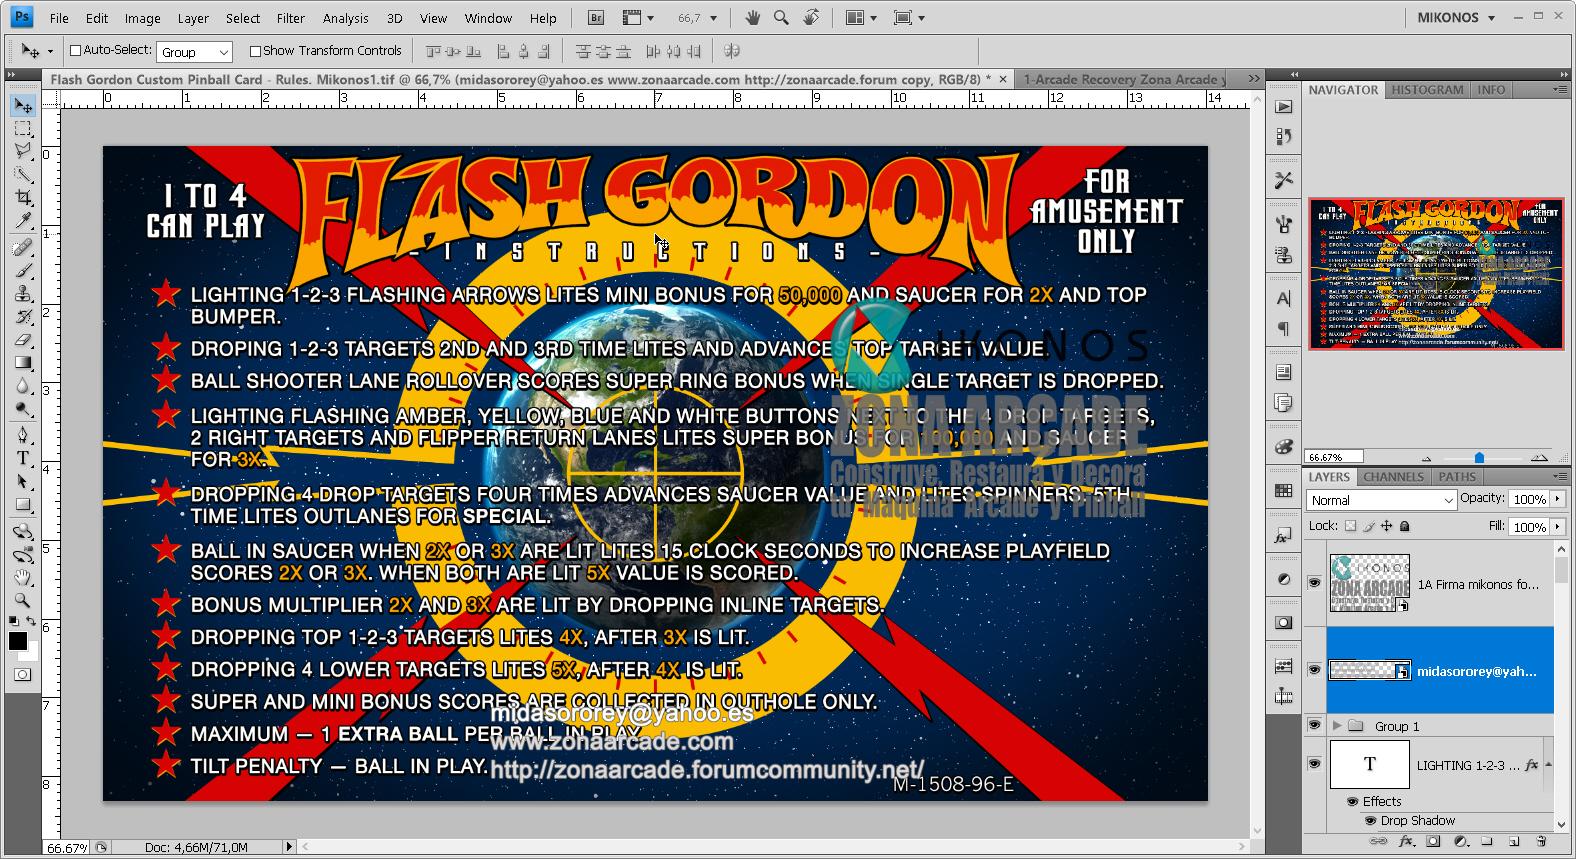 Flash%20Gordon%20Custom%20Pinball%20Card%20-%20Rules.%20Mikonos1.jpg